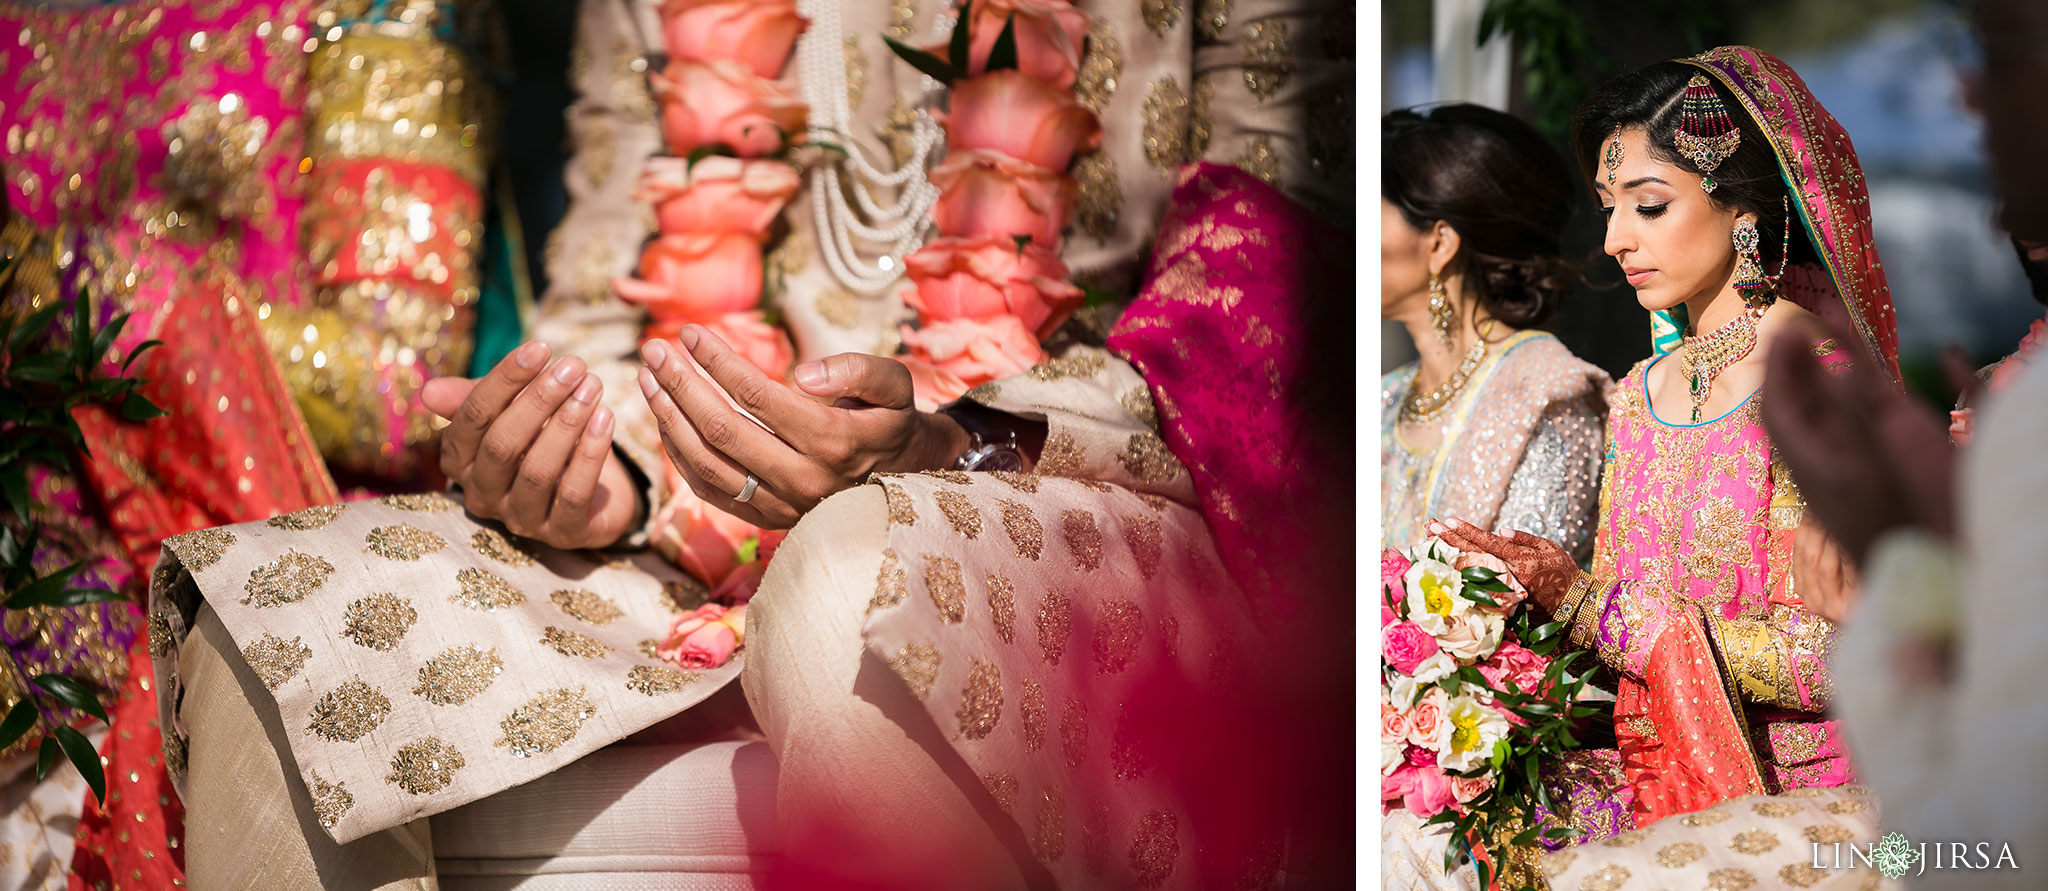 31 laguna cliffs marriott muslim wedding ceremony nikah photography